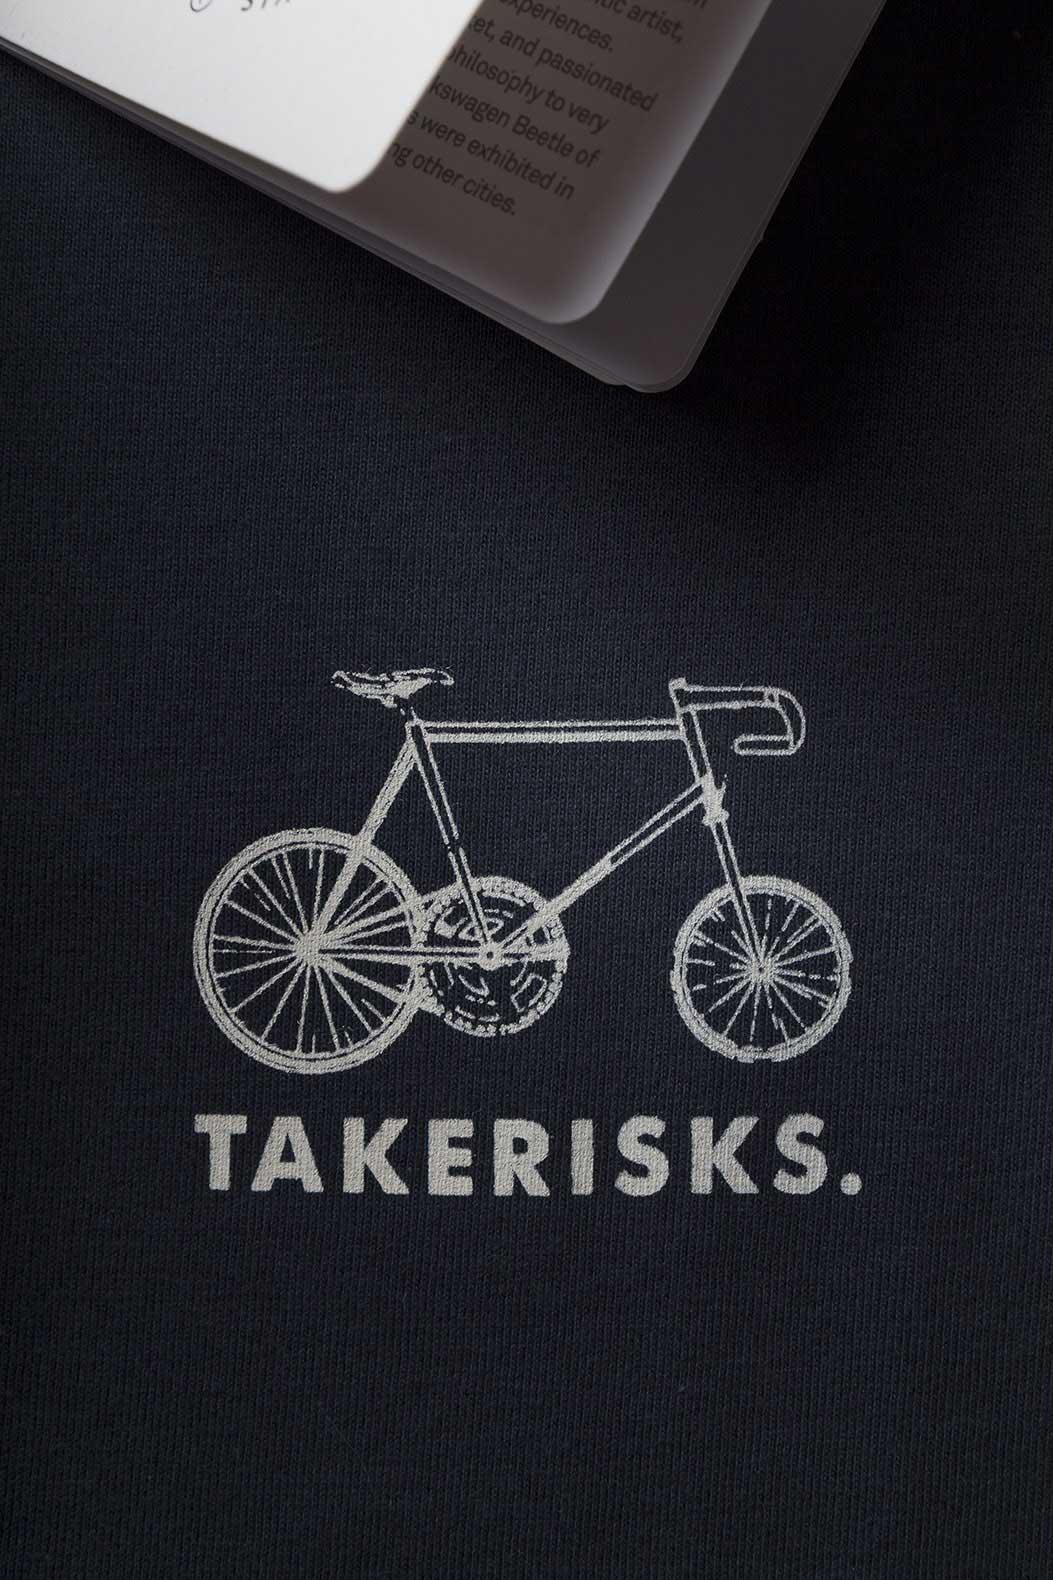 take-risks-print-navy-t-shirt